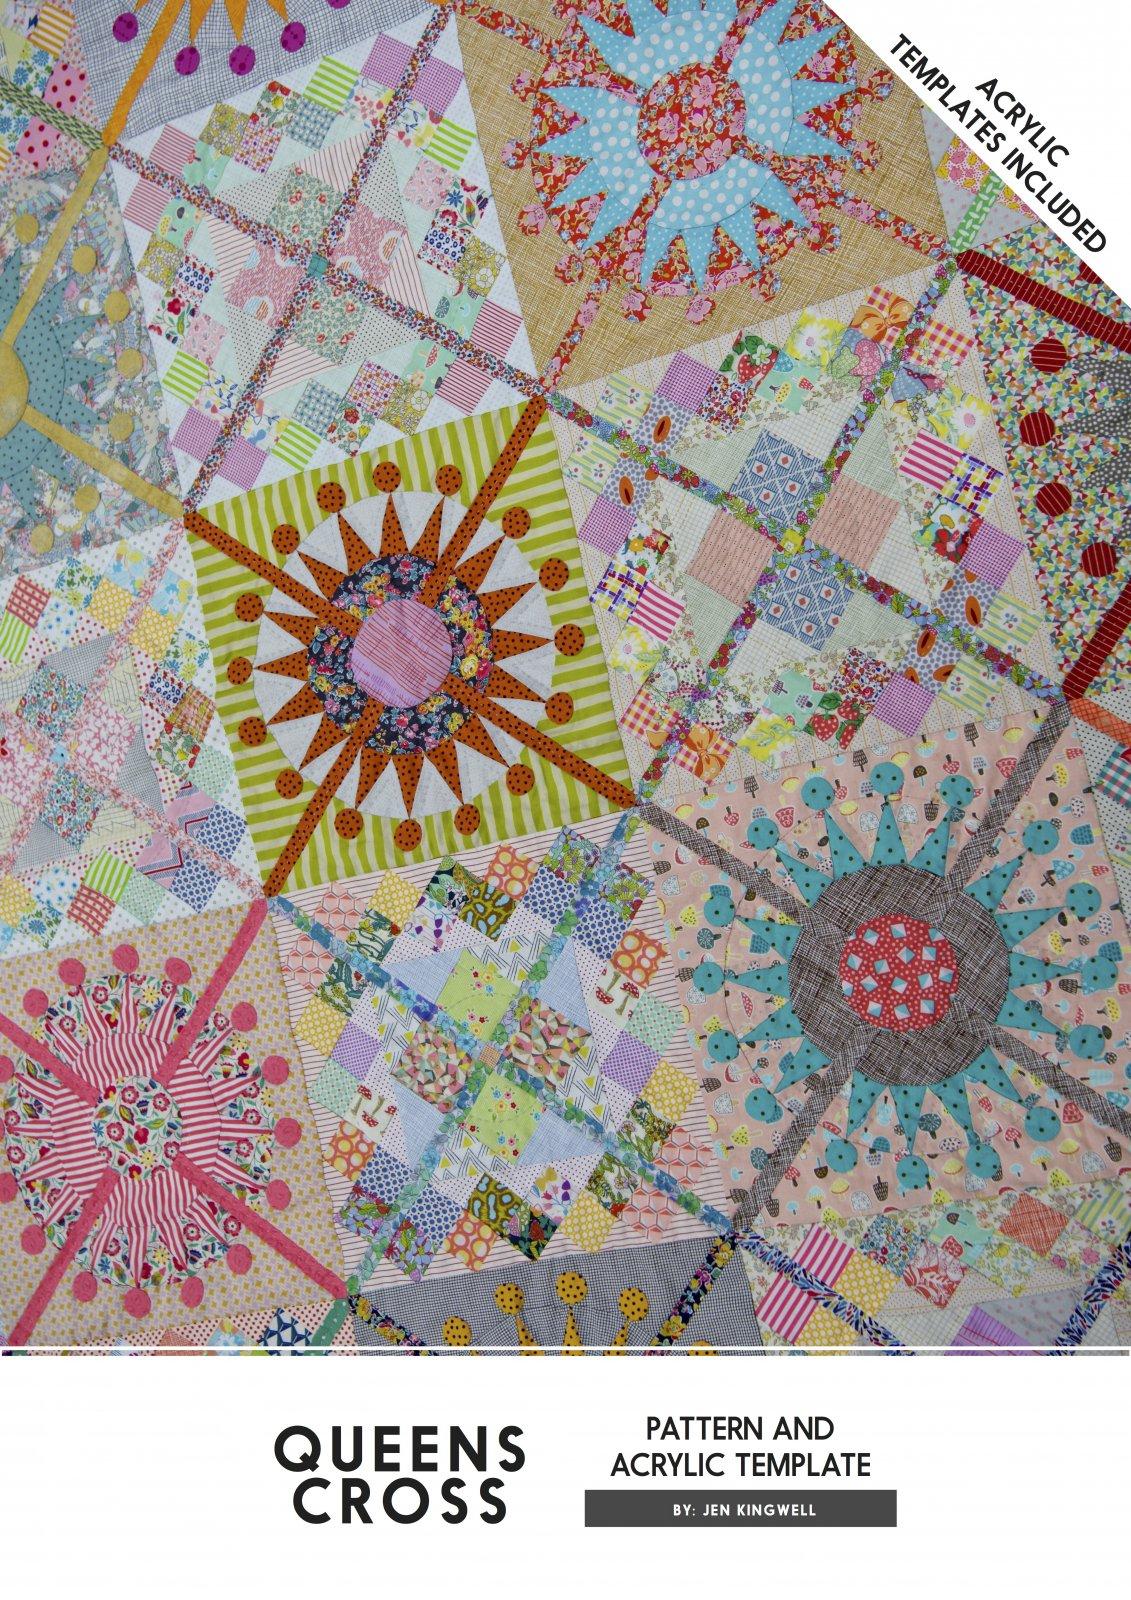 Queens Cross Patter & Acrylic Templates (ATI) by Jen Kingwell